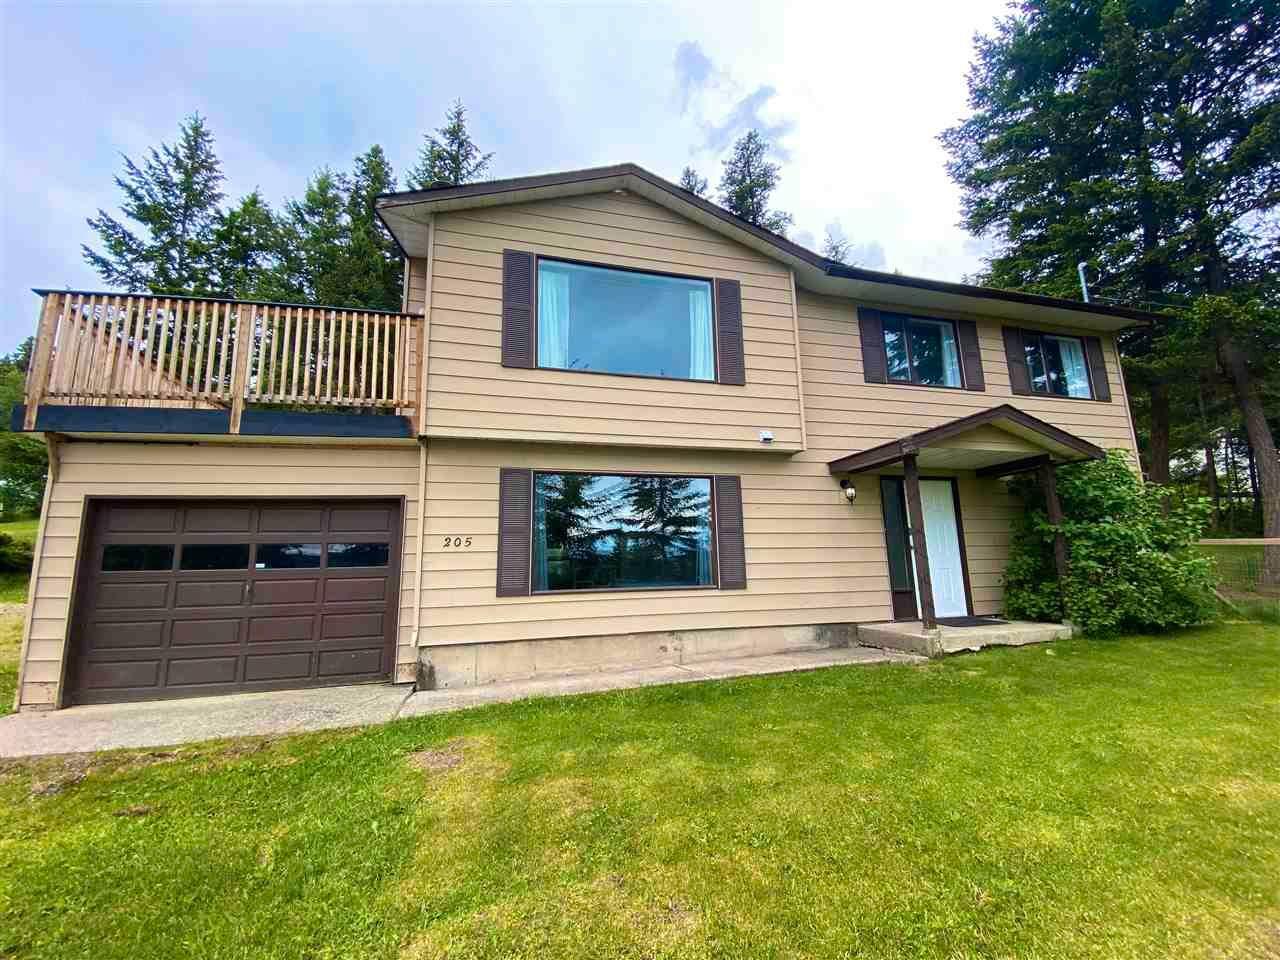 Main Photo: 205 GIBBON Road in Williams Lake: Esler/Dog Creek House for sale (Williams Lake (Zone 27))  : MLS®# R2593433